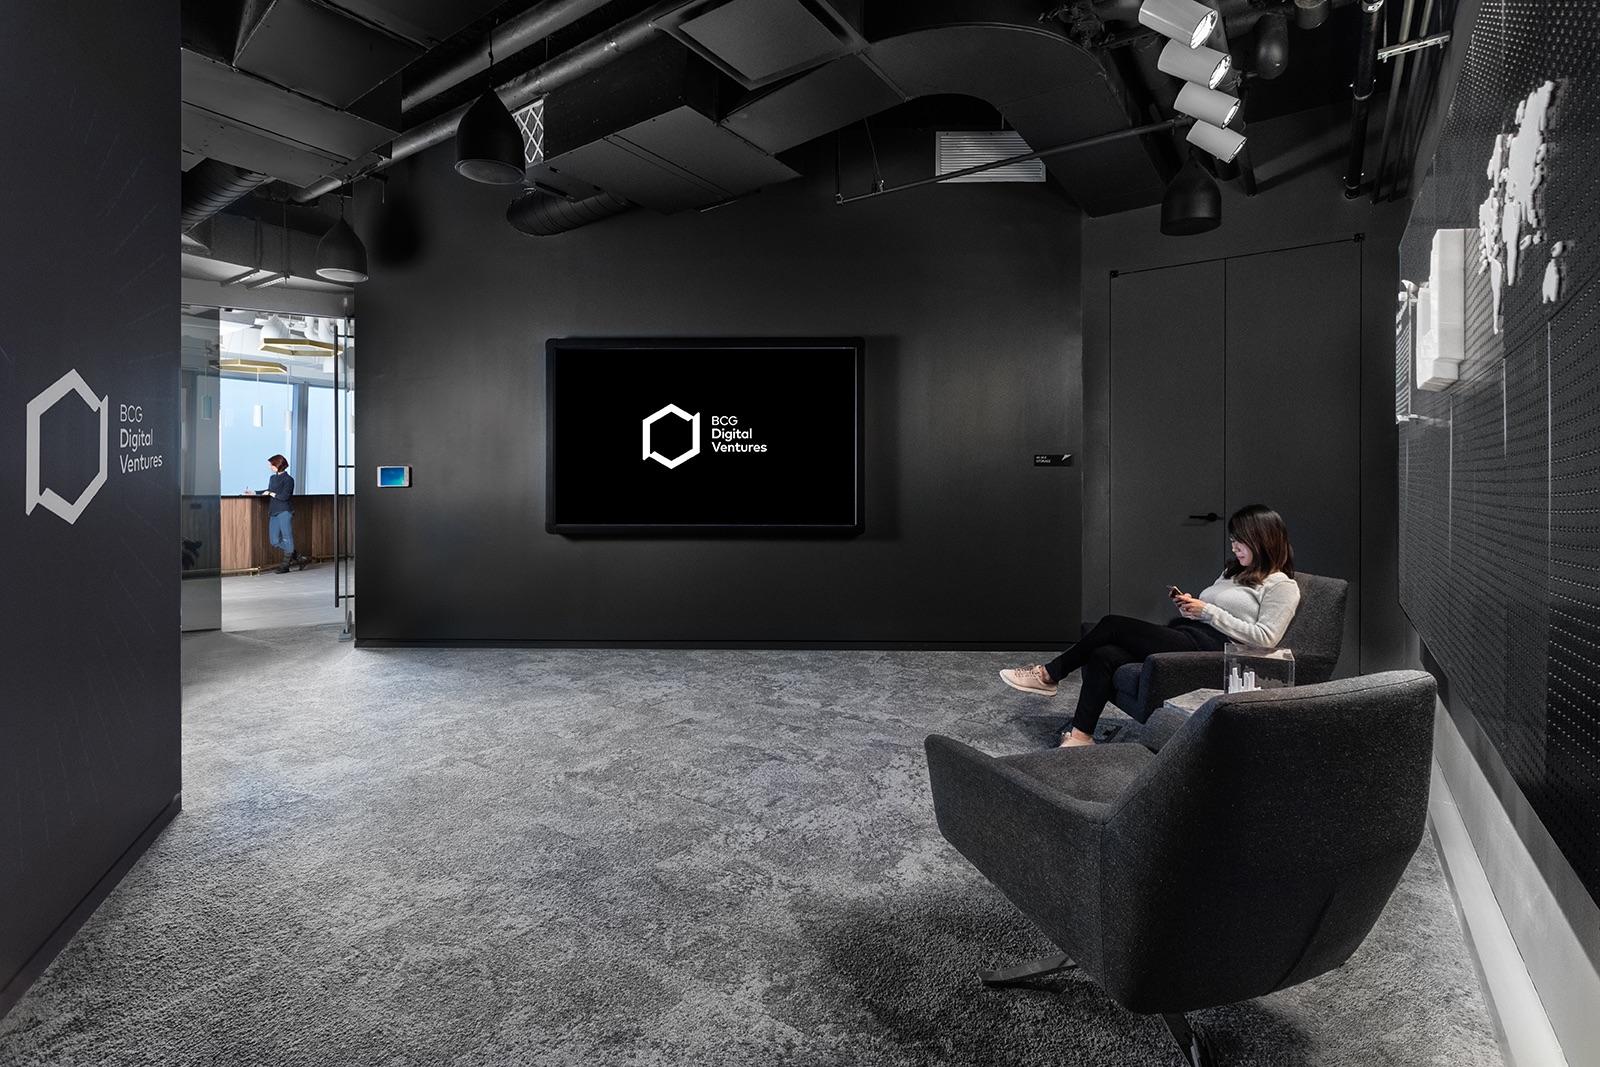 bcg-digital-ventures-office-4